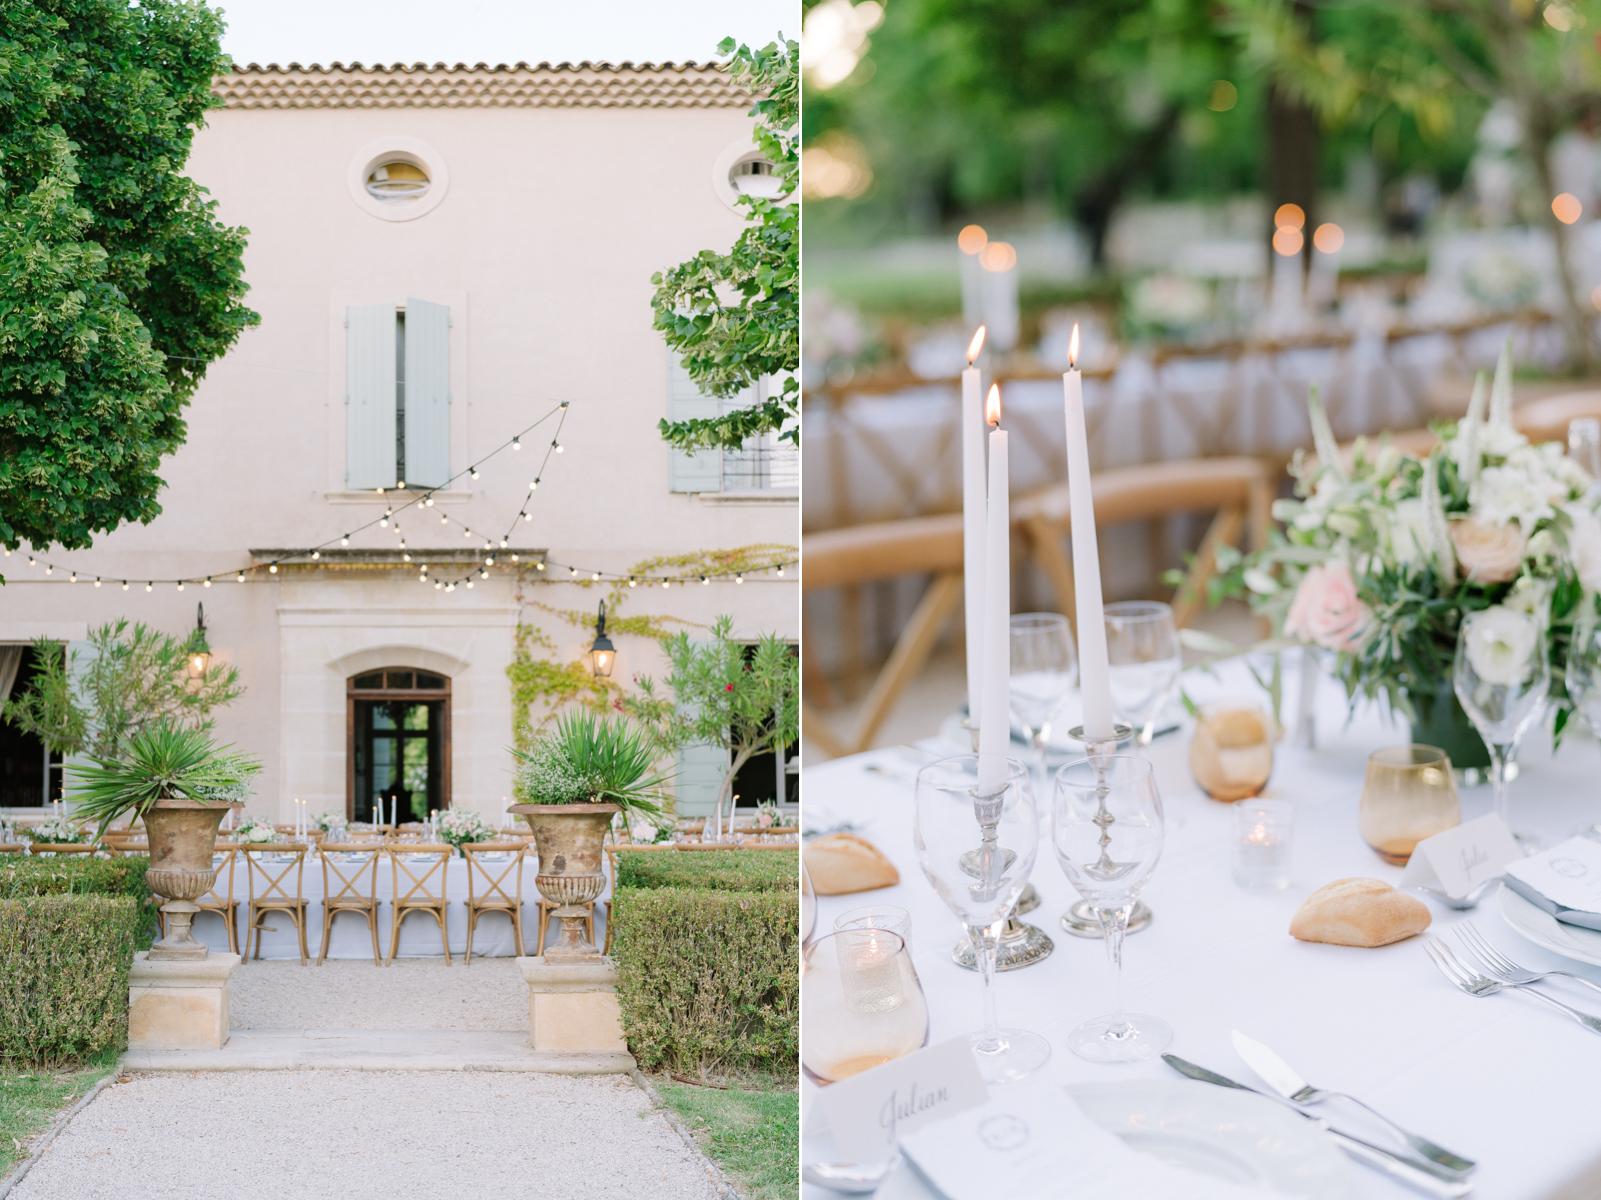 Boheme-Moon-Photography-Wedding-in-Provence-France_019.jpg